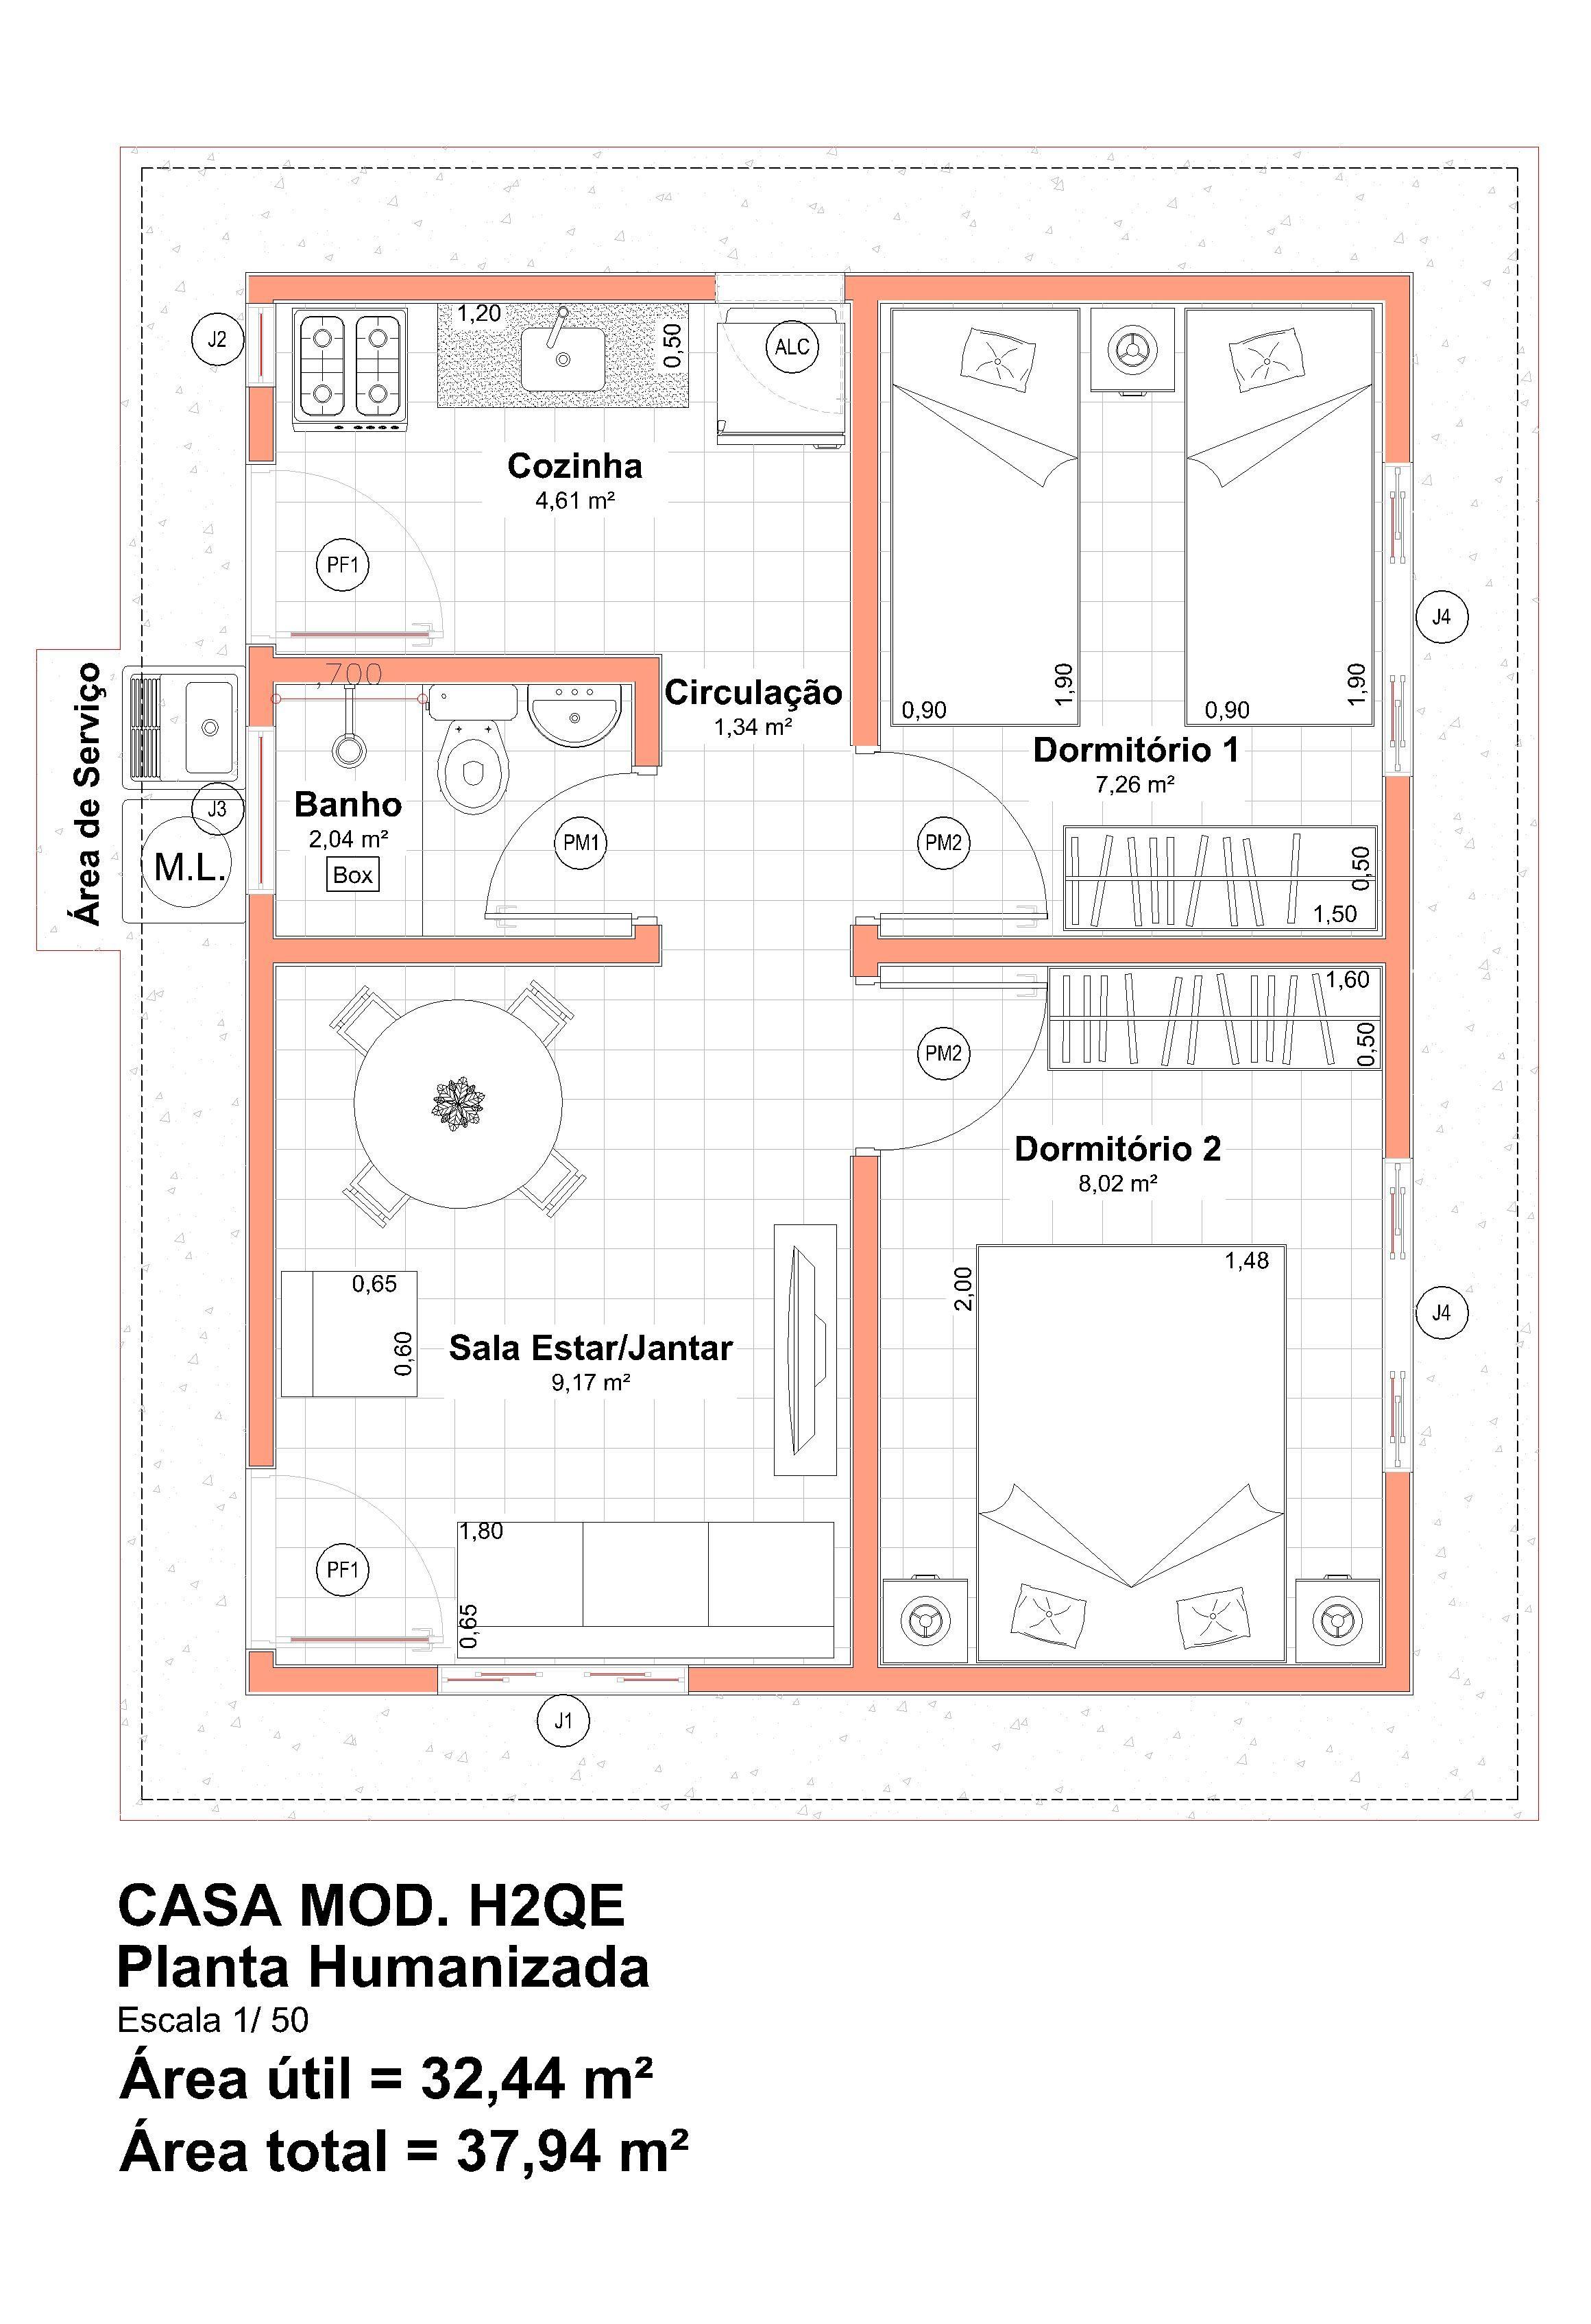 casa planta 36m2 intercambiar baño/cocina ... | Bach in NZ ...